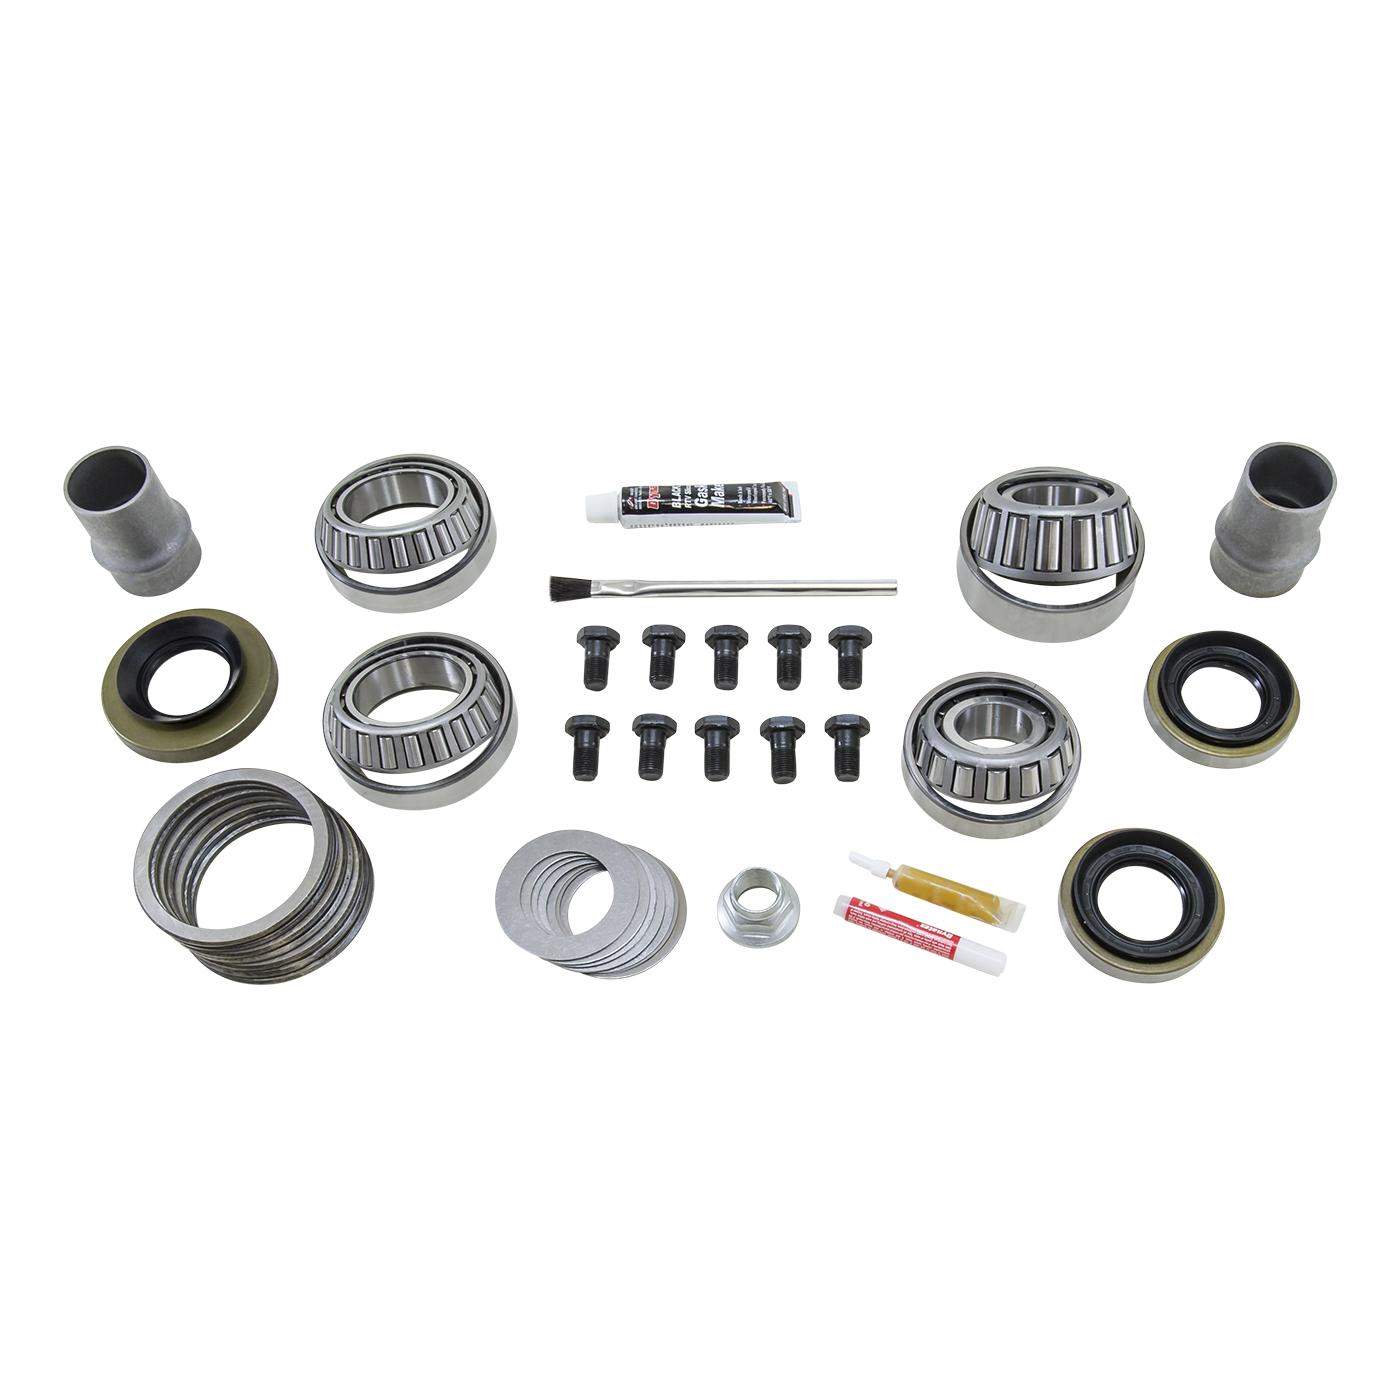 Yukon Gear 37109 Usa Standard Master Overhaul Kit For